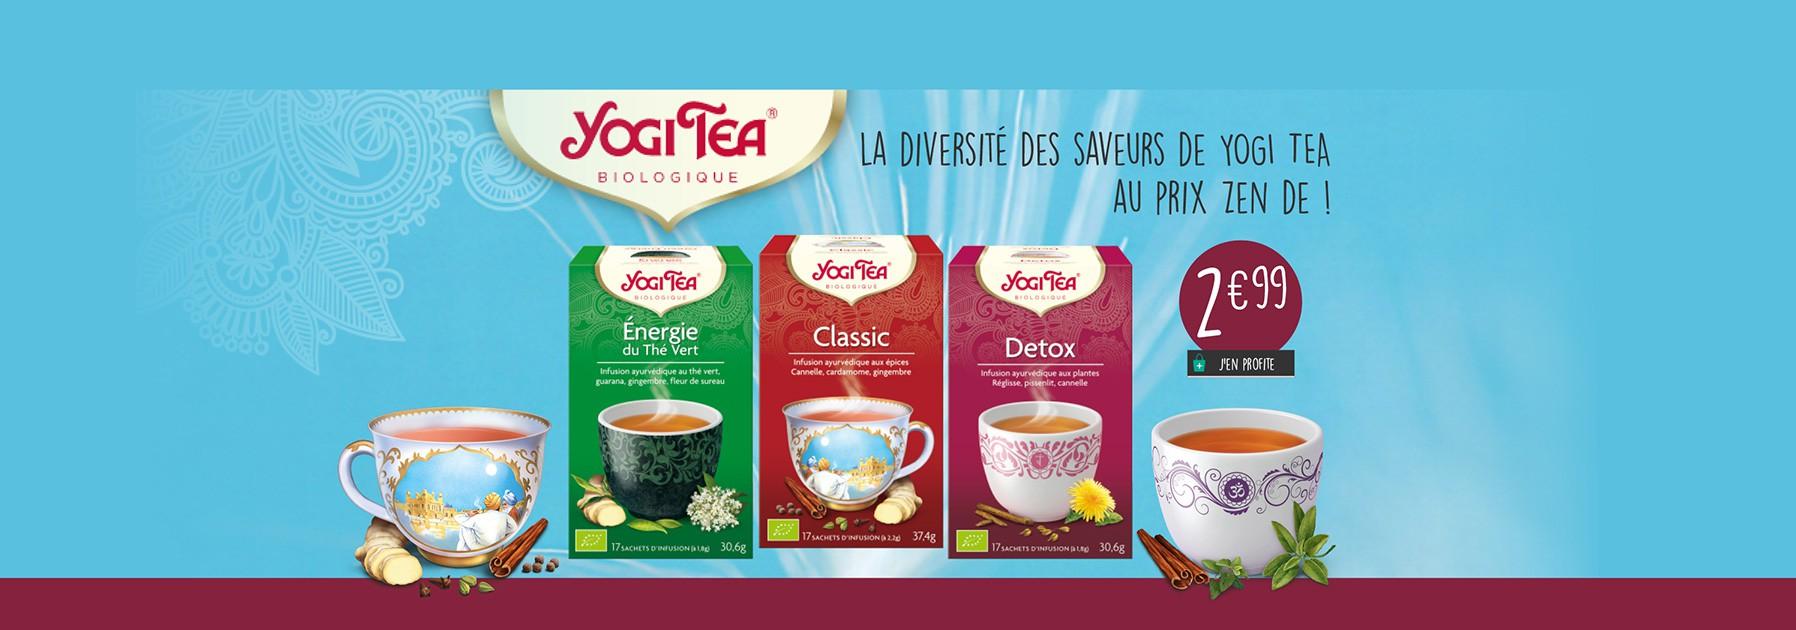 Thés et infusions Yogi Tea